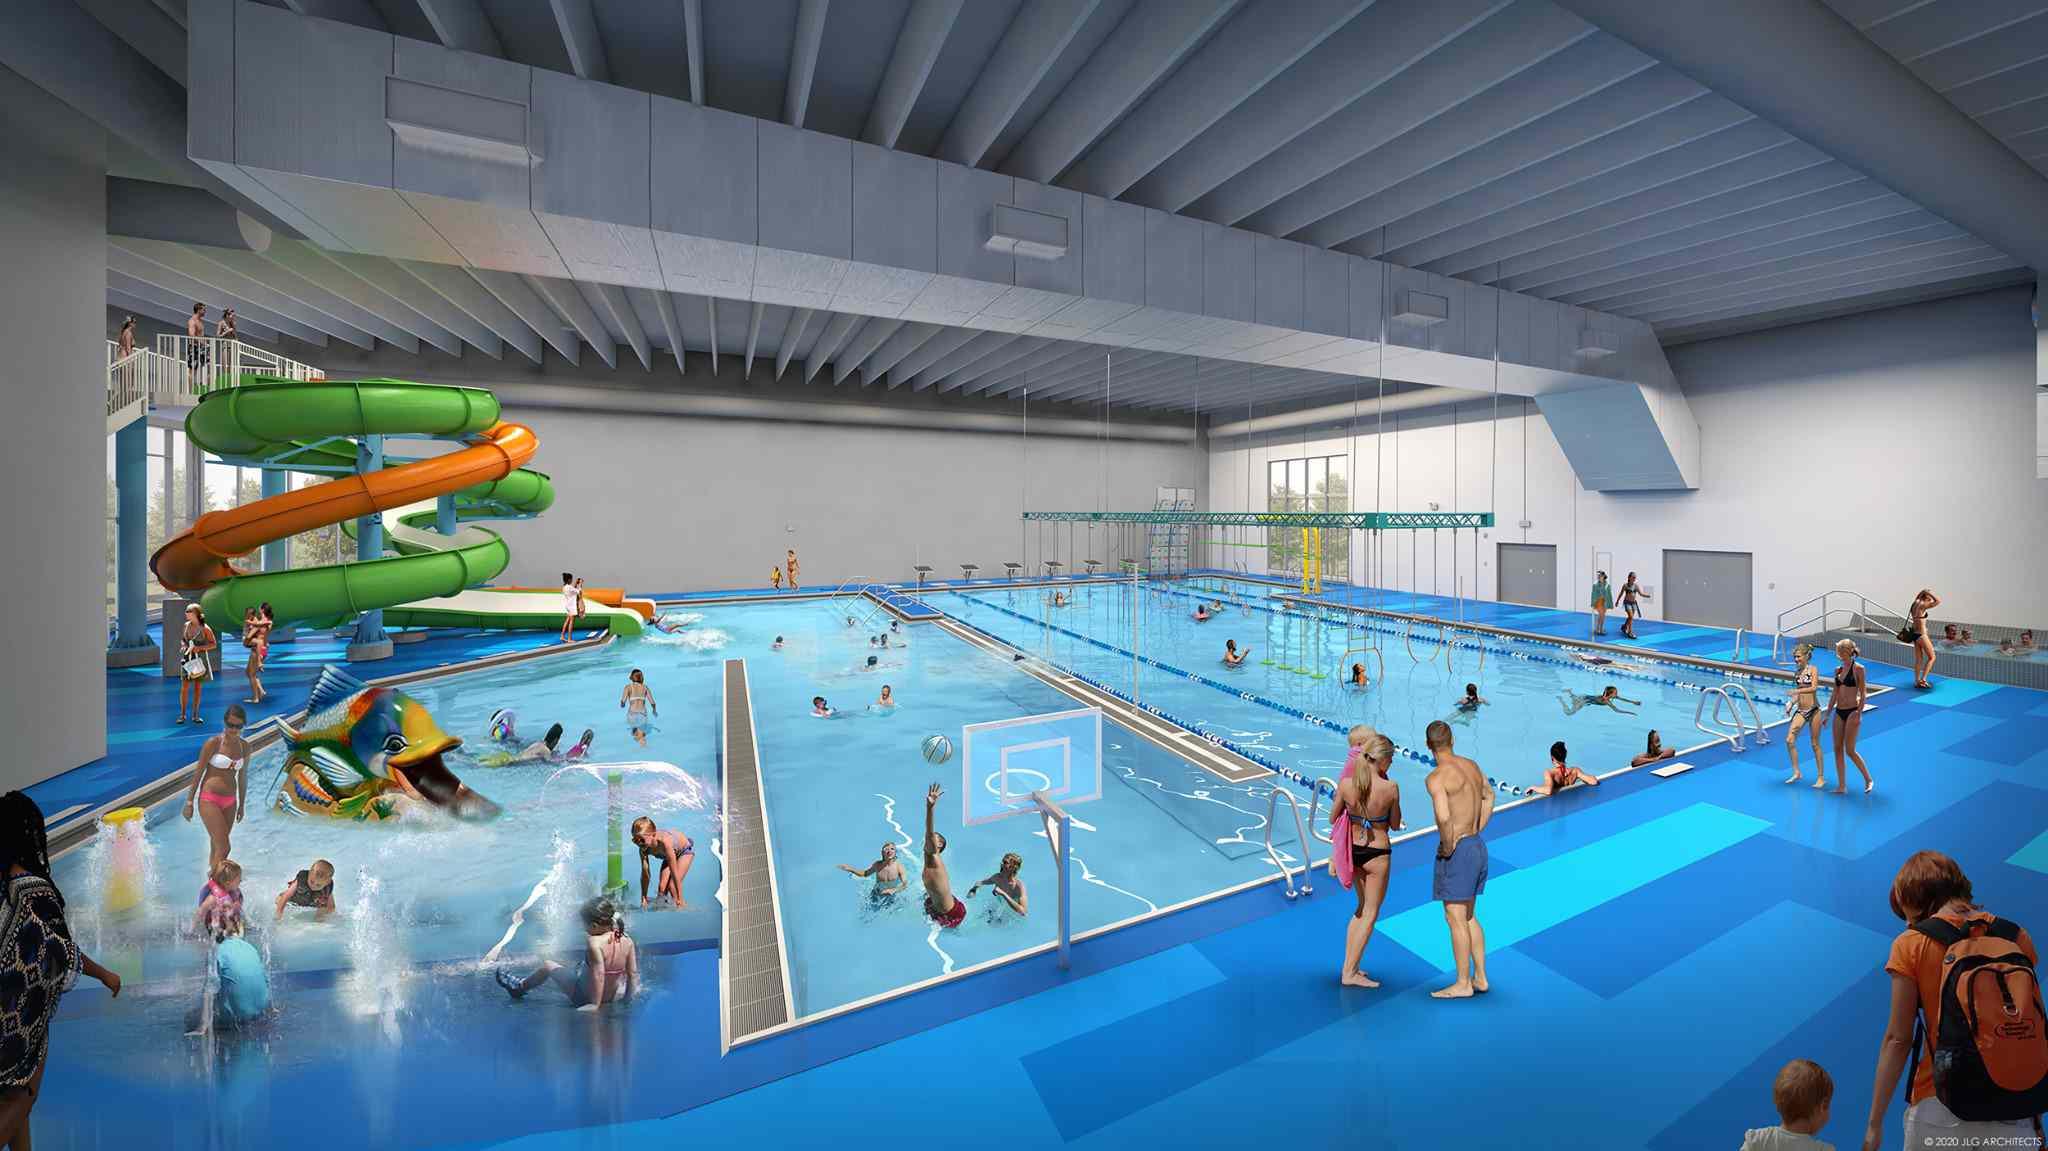 New Ulm water park in Minnesota